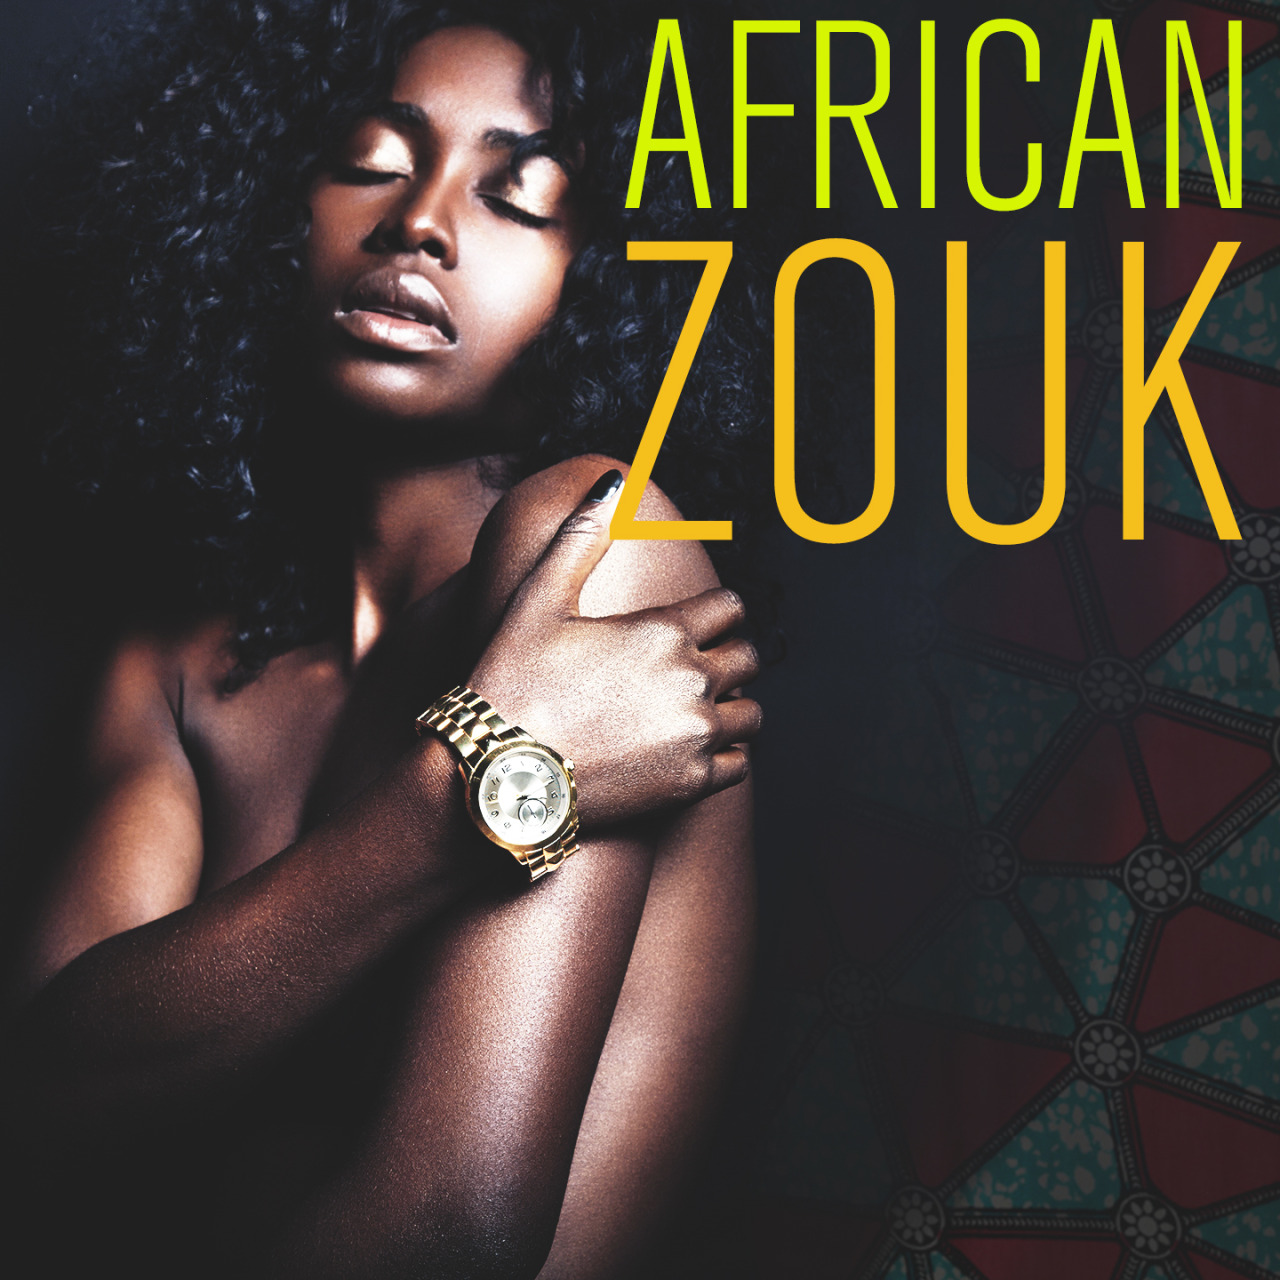 Afrozouk Afrostation.com